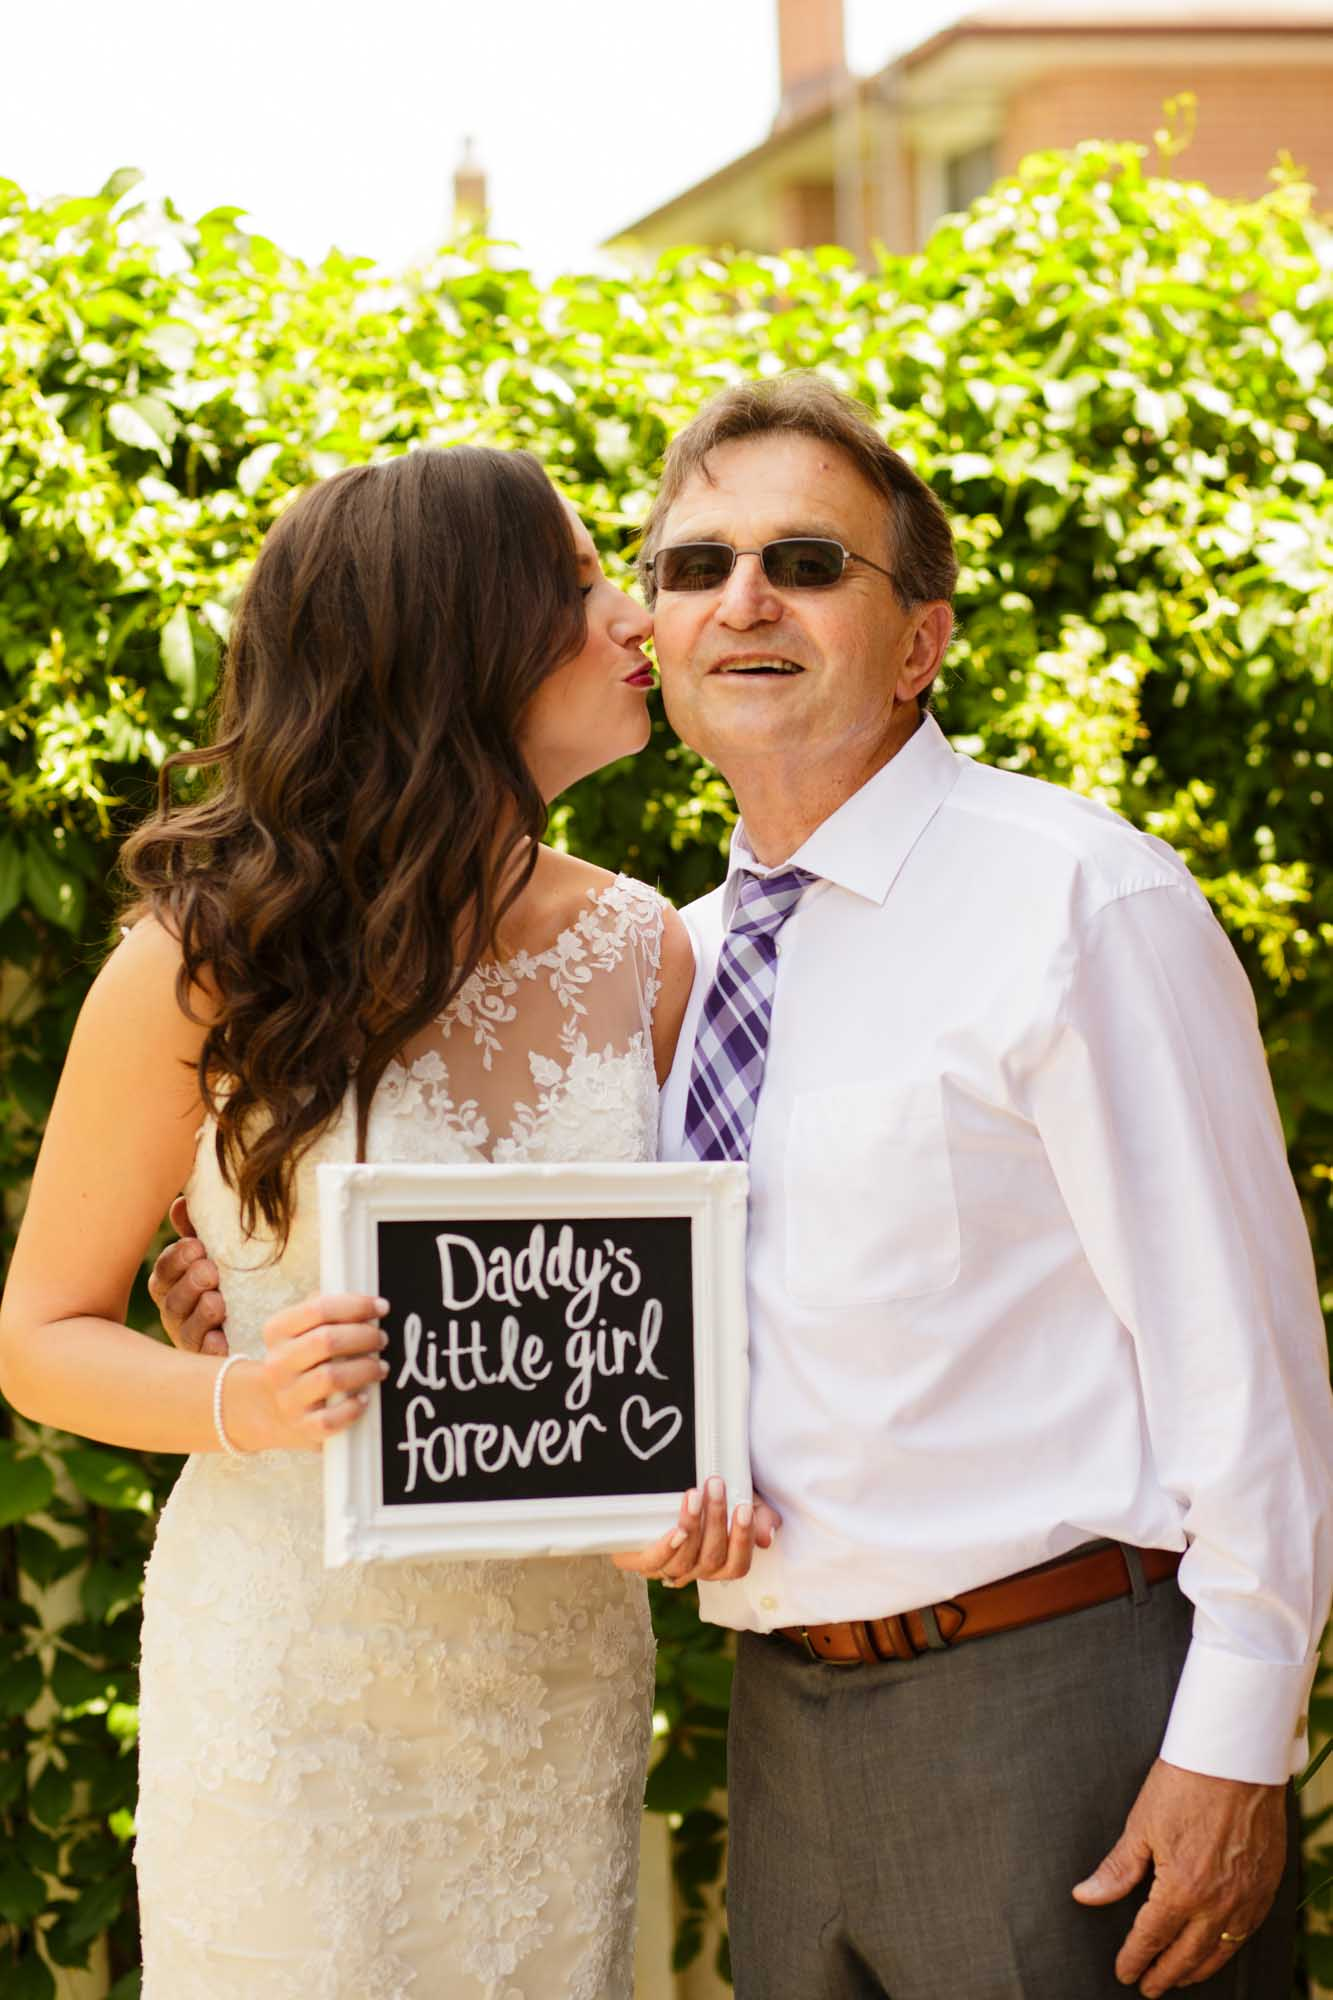 Jasmin and Dad